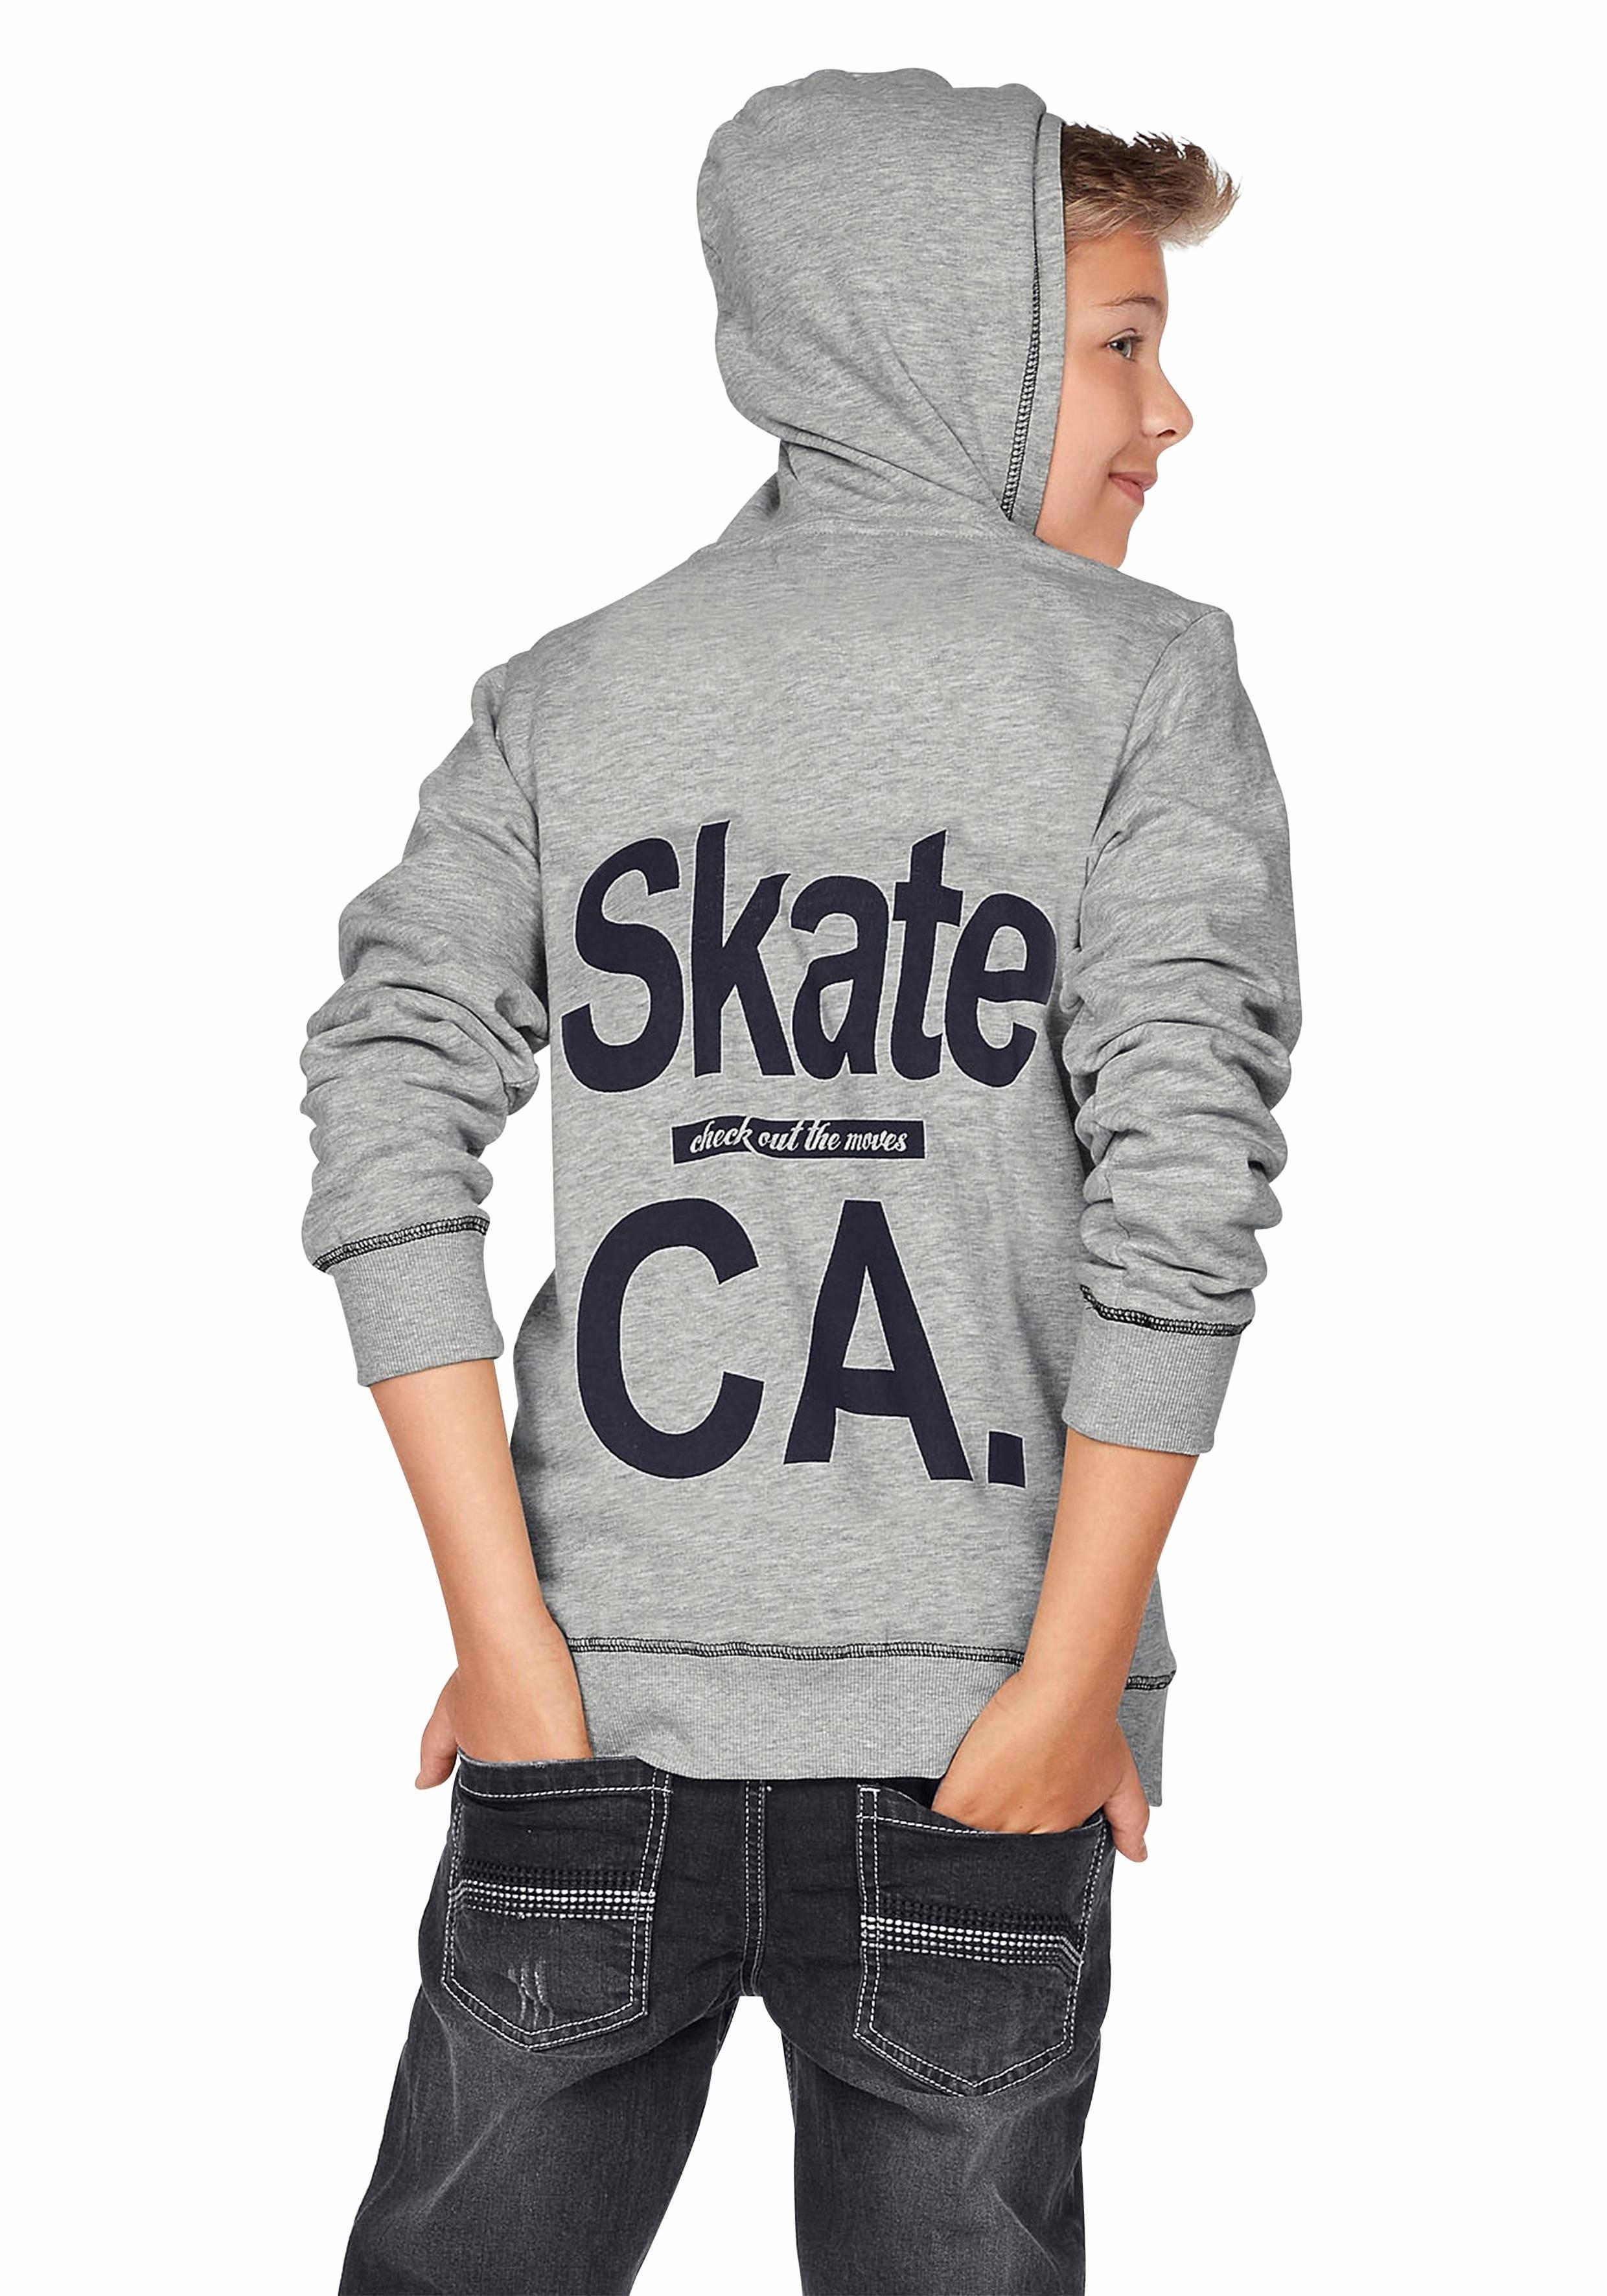 3e2020e2616 ... NIKE Team Club trainingstrui met capuchon voor kinderen, PUMA hoodie  »ESSENTIAL LOGO HOODY TR BOYS«, adidas Performance sweatshirt »Core 15«, ...